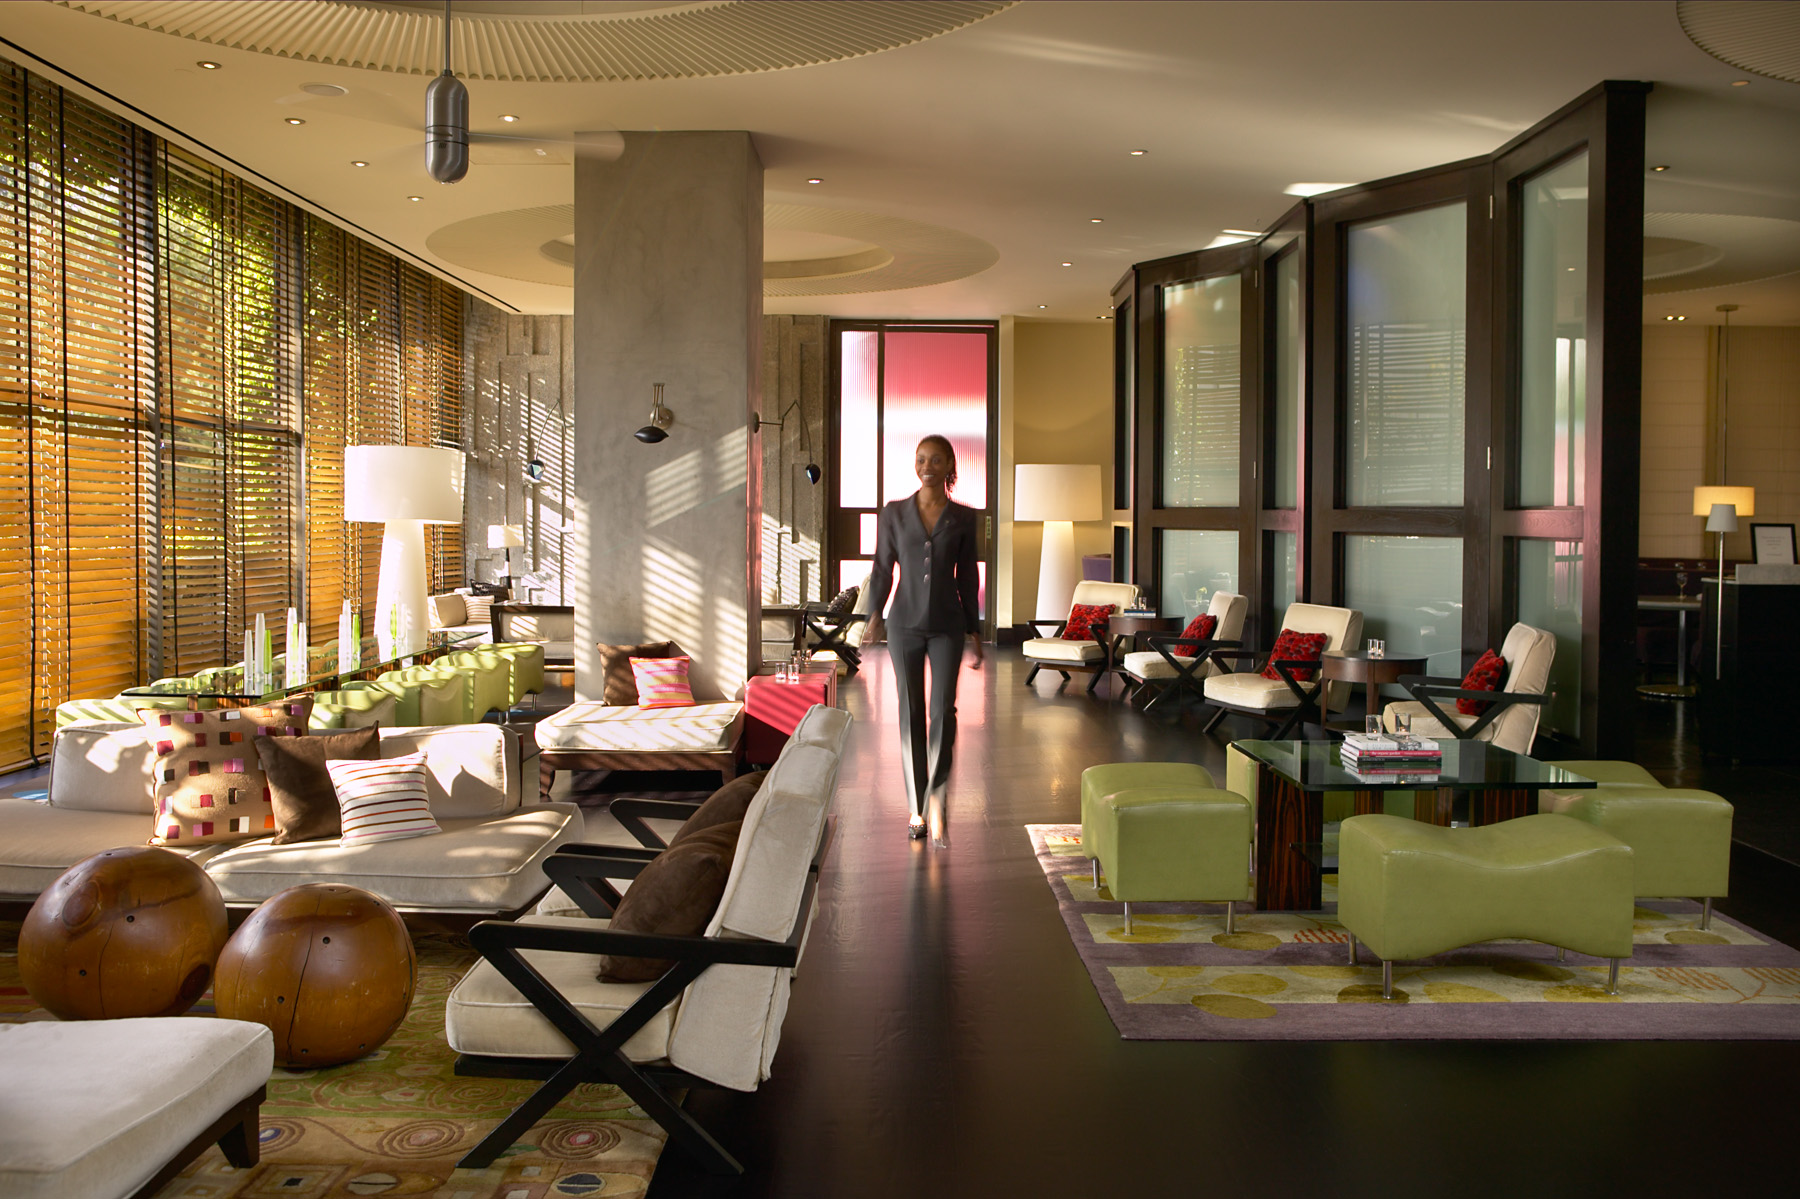 W Hotel - Los Angeles